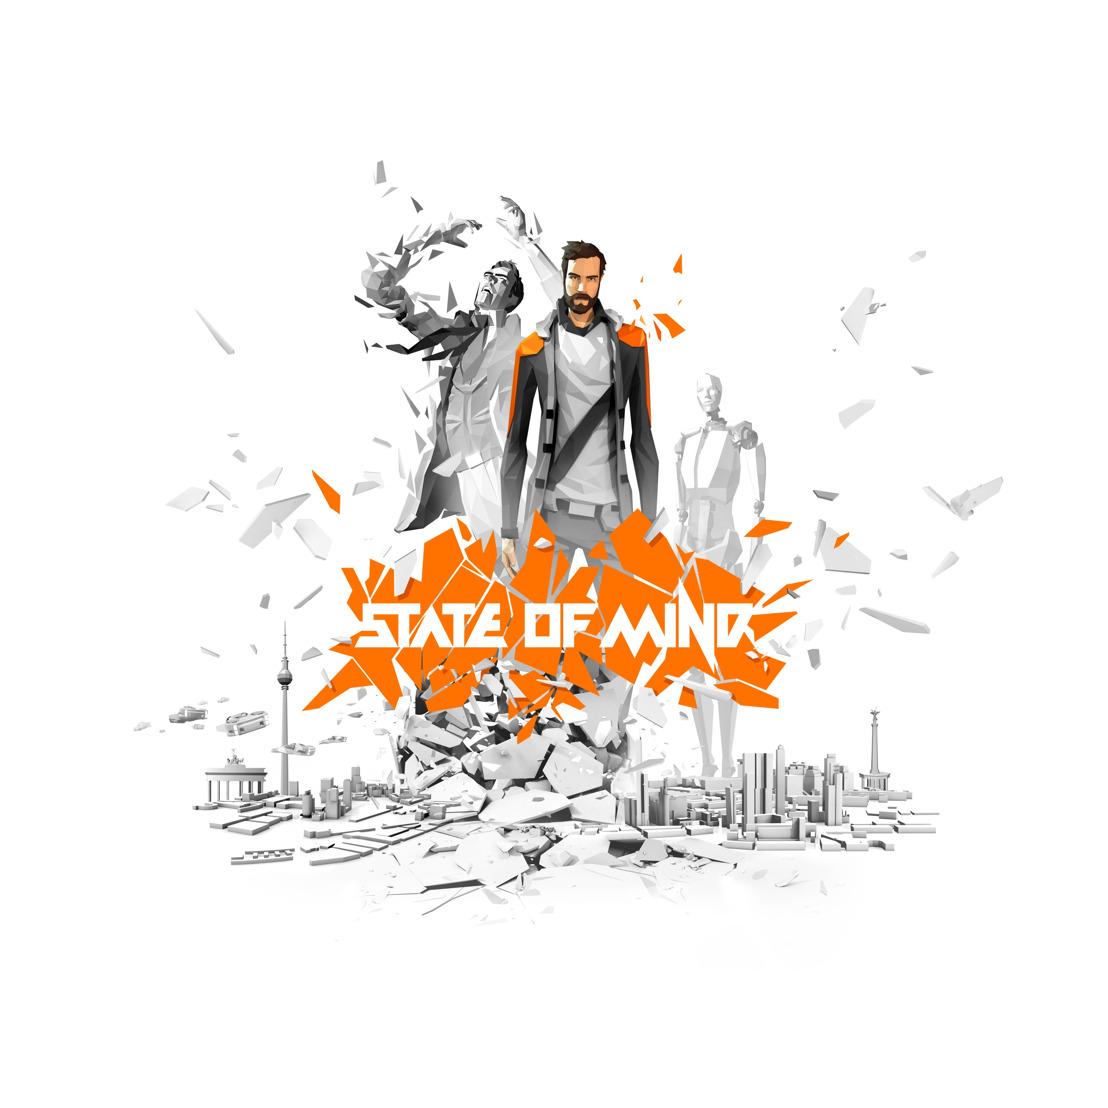 State of Mind - Daedalic startet Vorverkauf